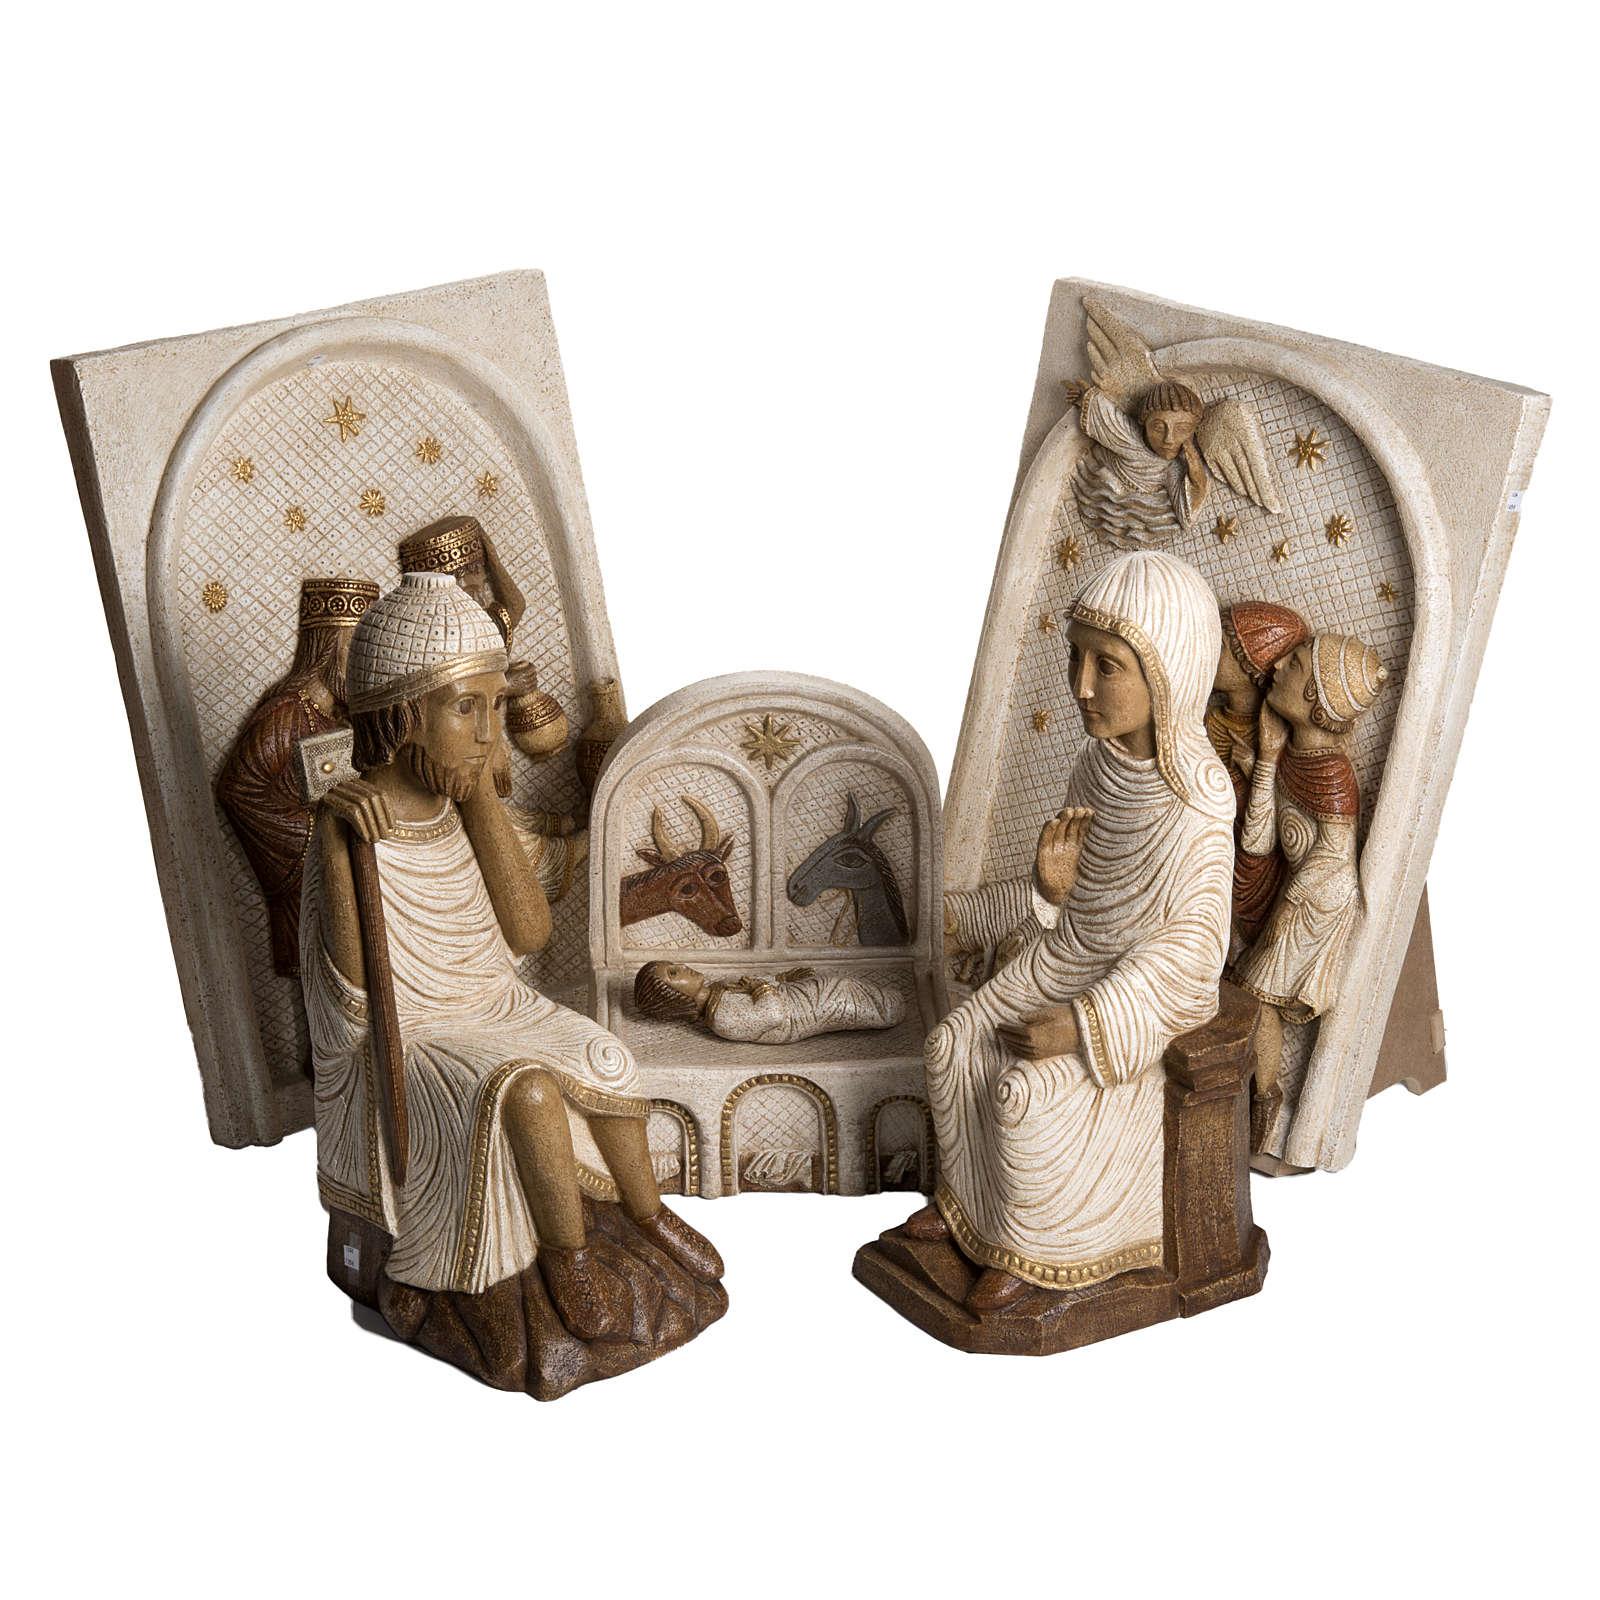 Gran pesebre otoñal blanco piedra Betlhéem 4